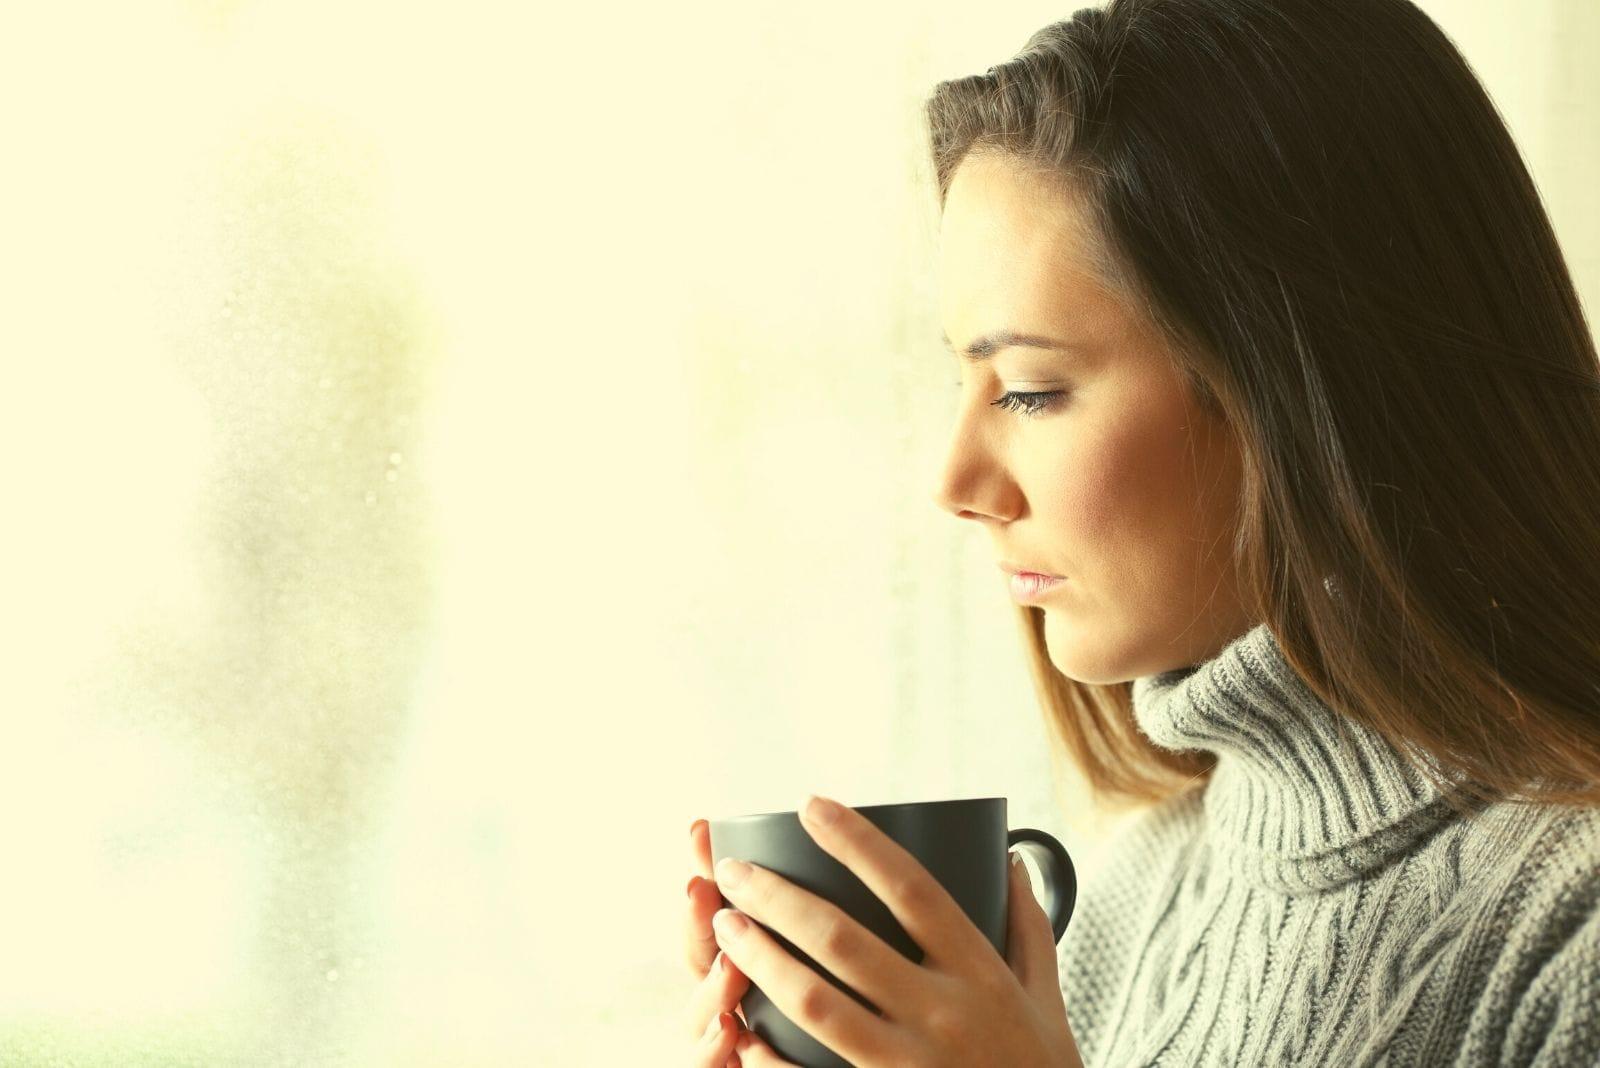 pensive sad woman drinking coffee near the glass window looking away